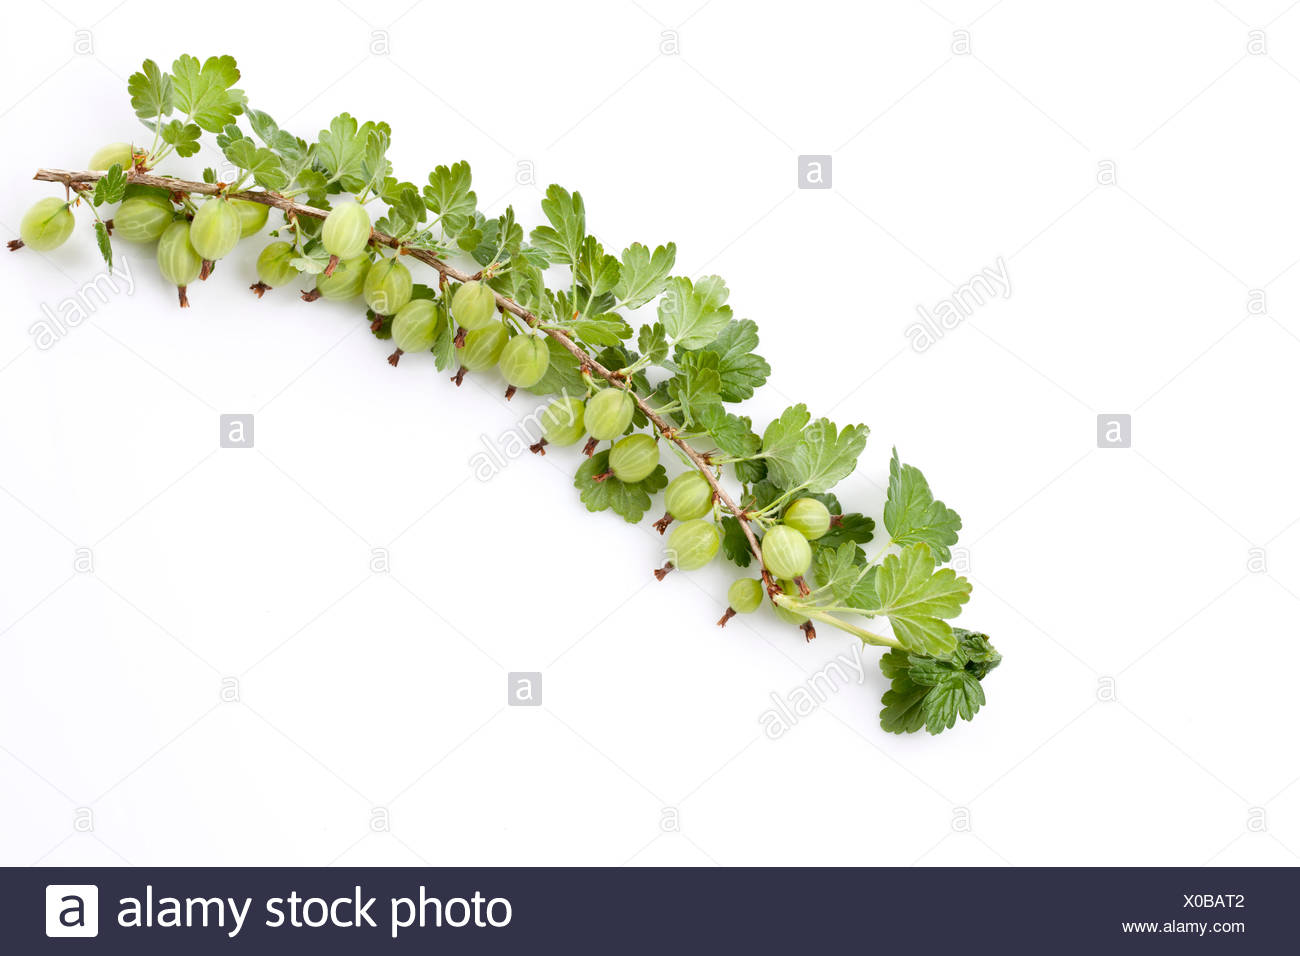 Gooseberry, Ribes uva-crispa, truss - Stock Image